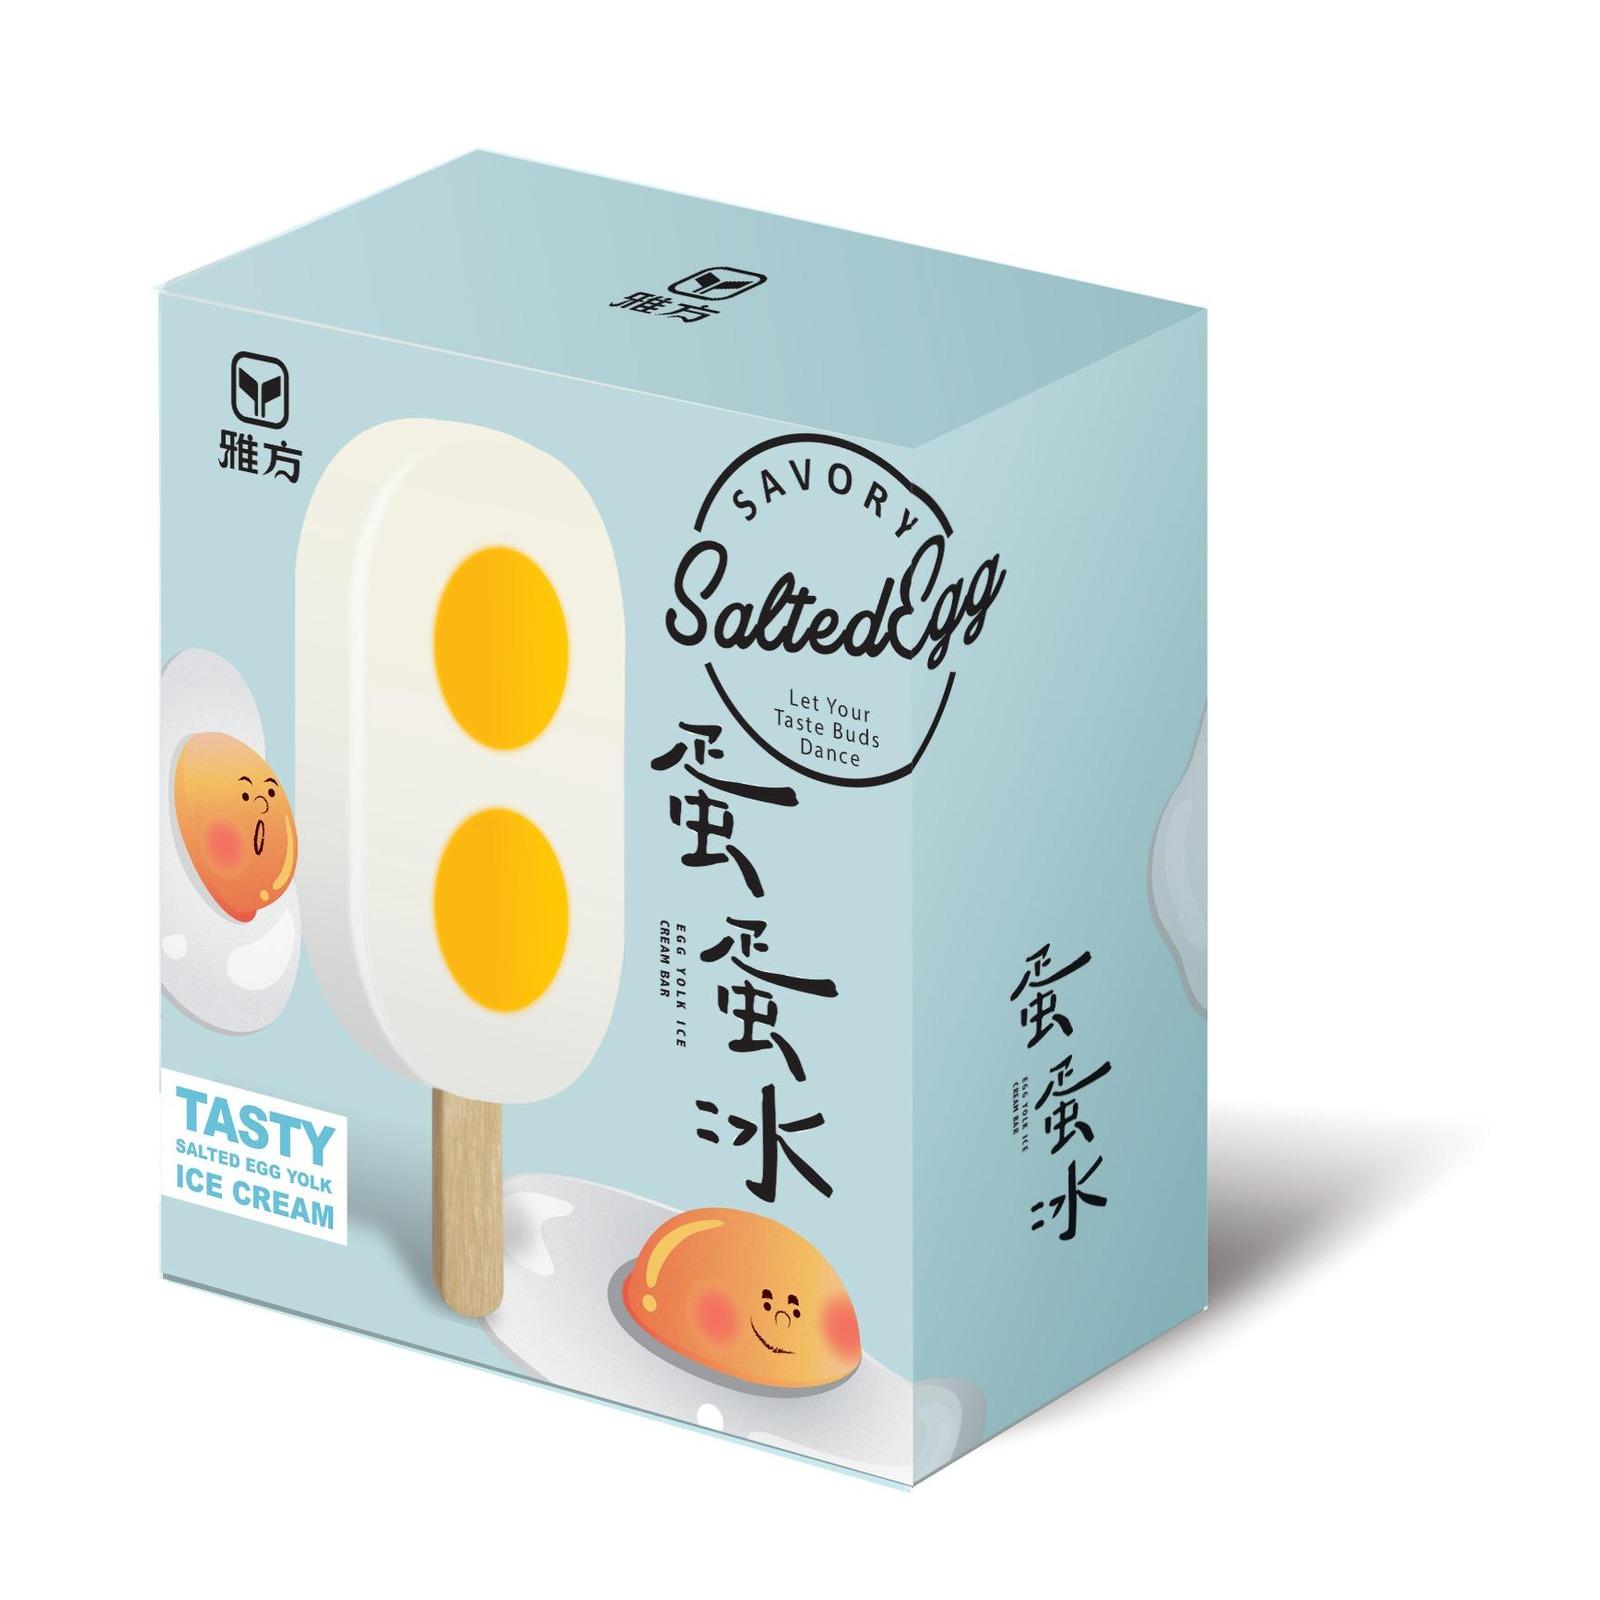 Ya Fang Salted Egg Yolk Flavour Ice Bars